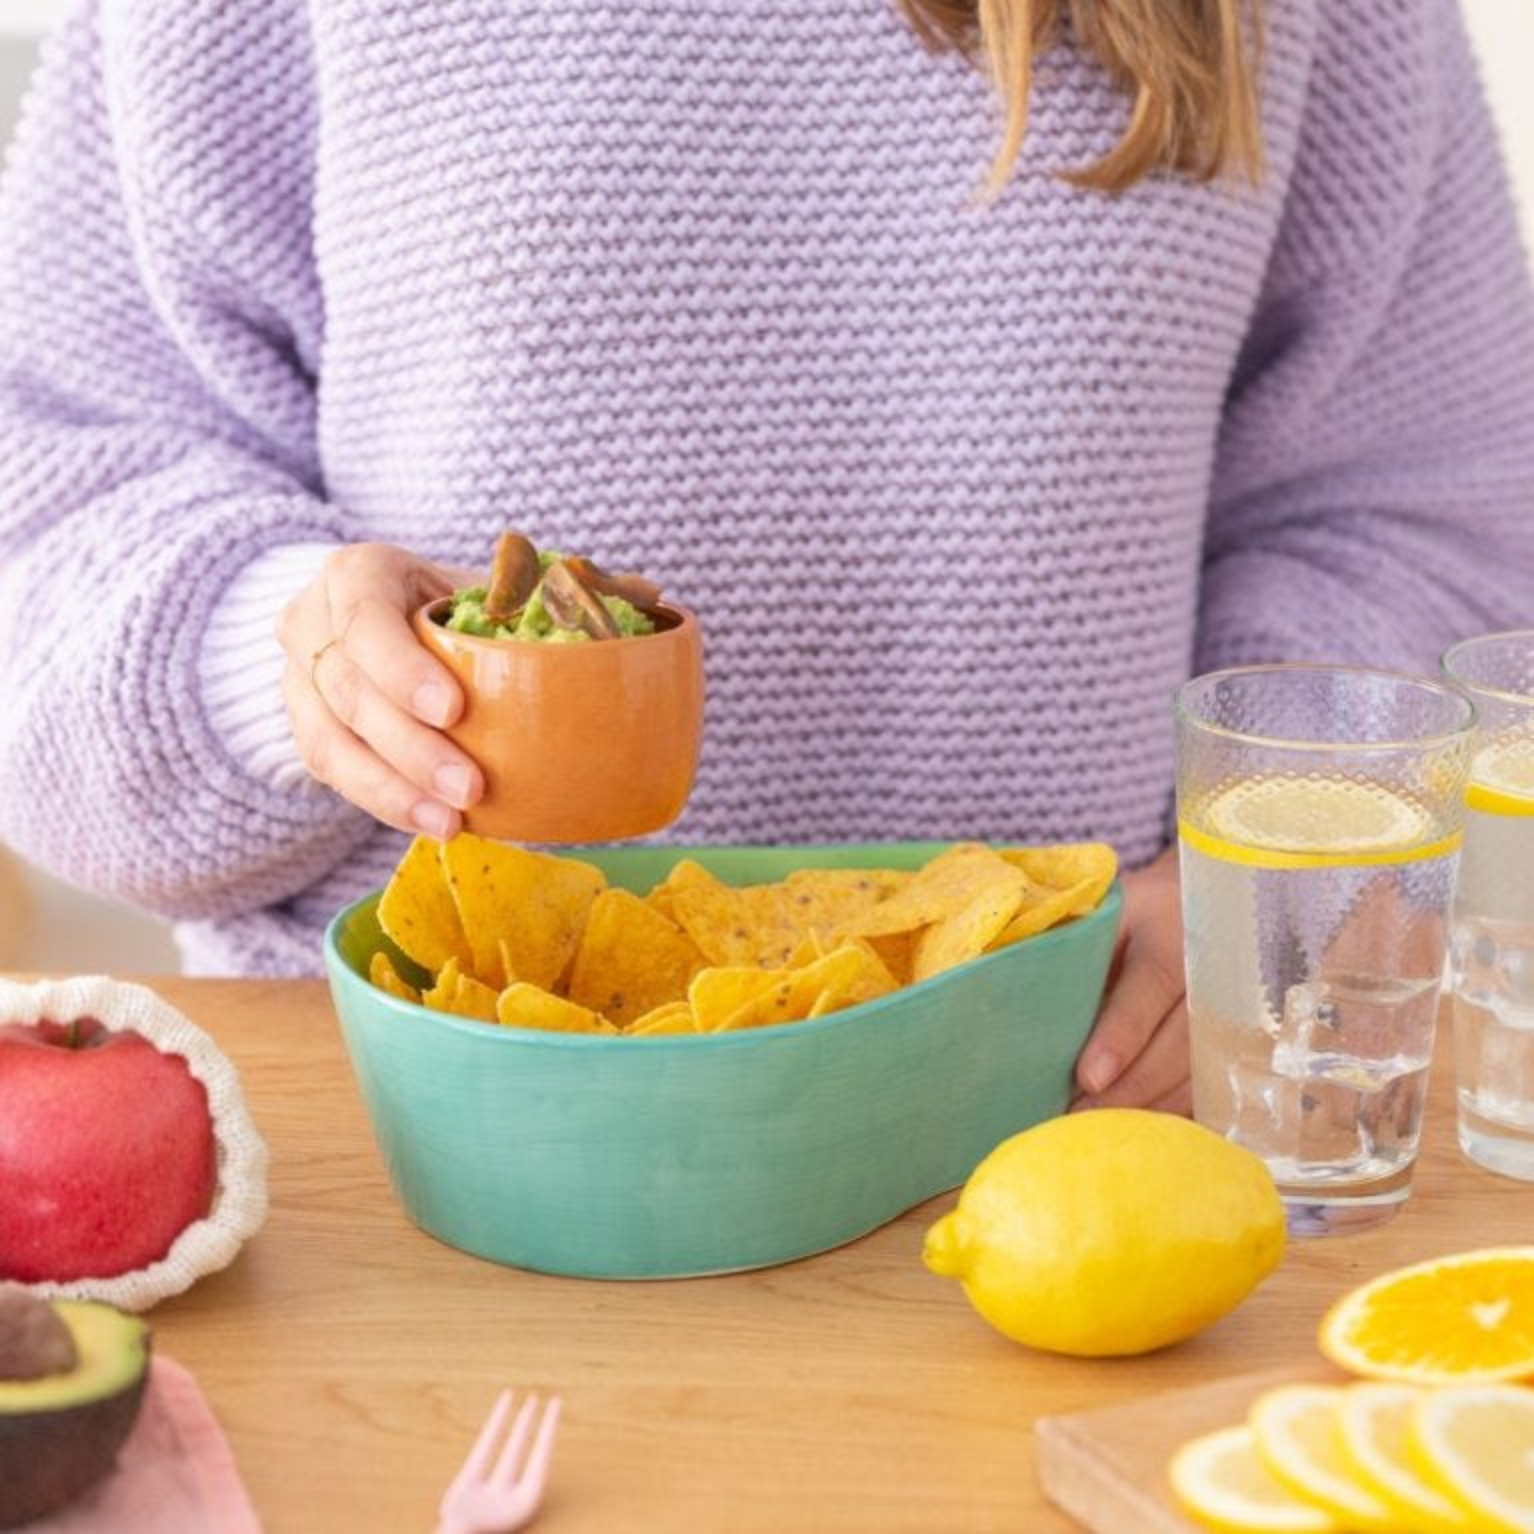 Snack bowl Mr. Wonderful x Balvi - Avocado